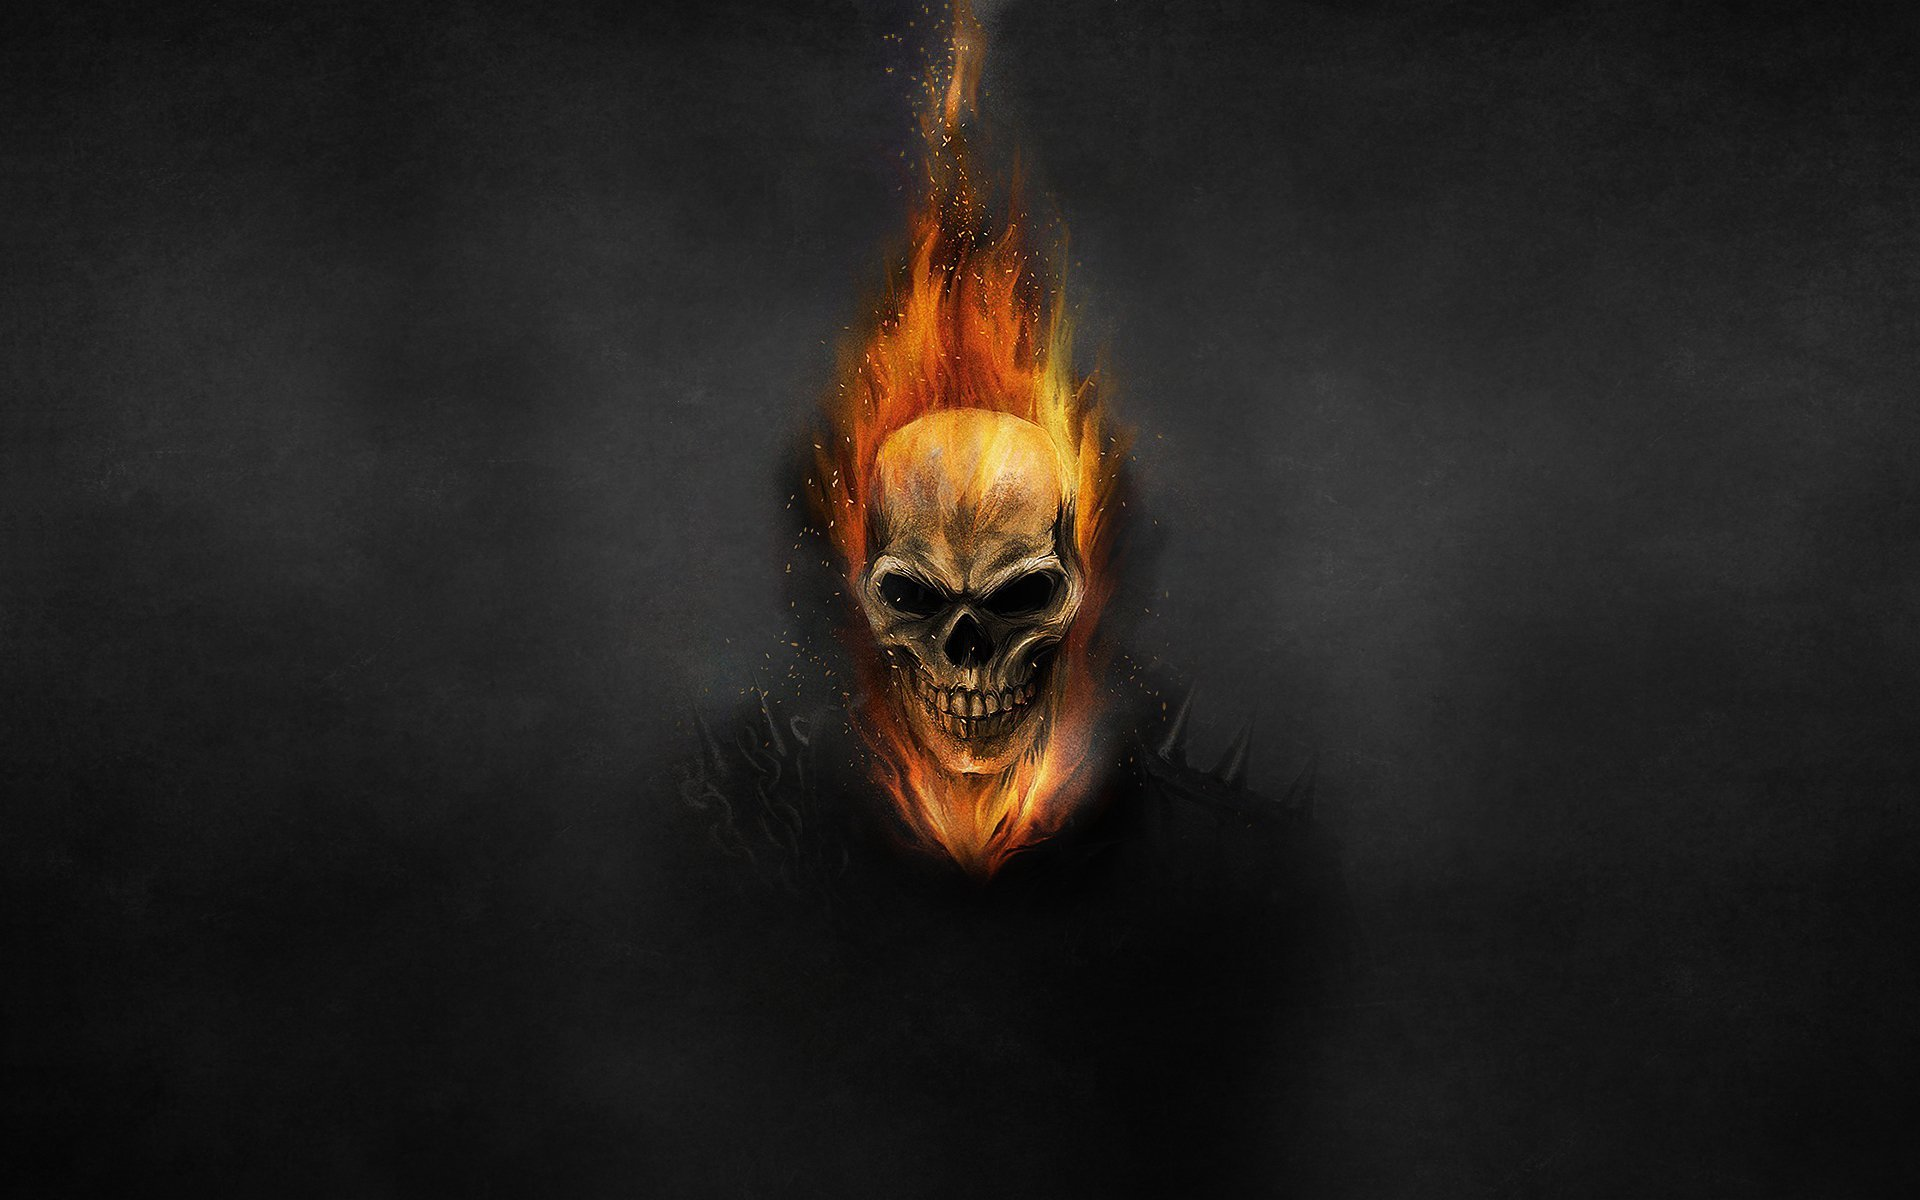 ghost rider ghost rider skeleton skull fire circuit dark